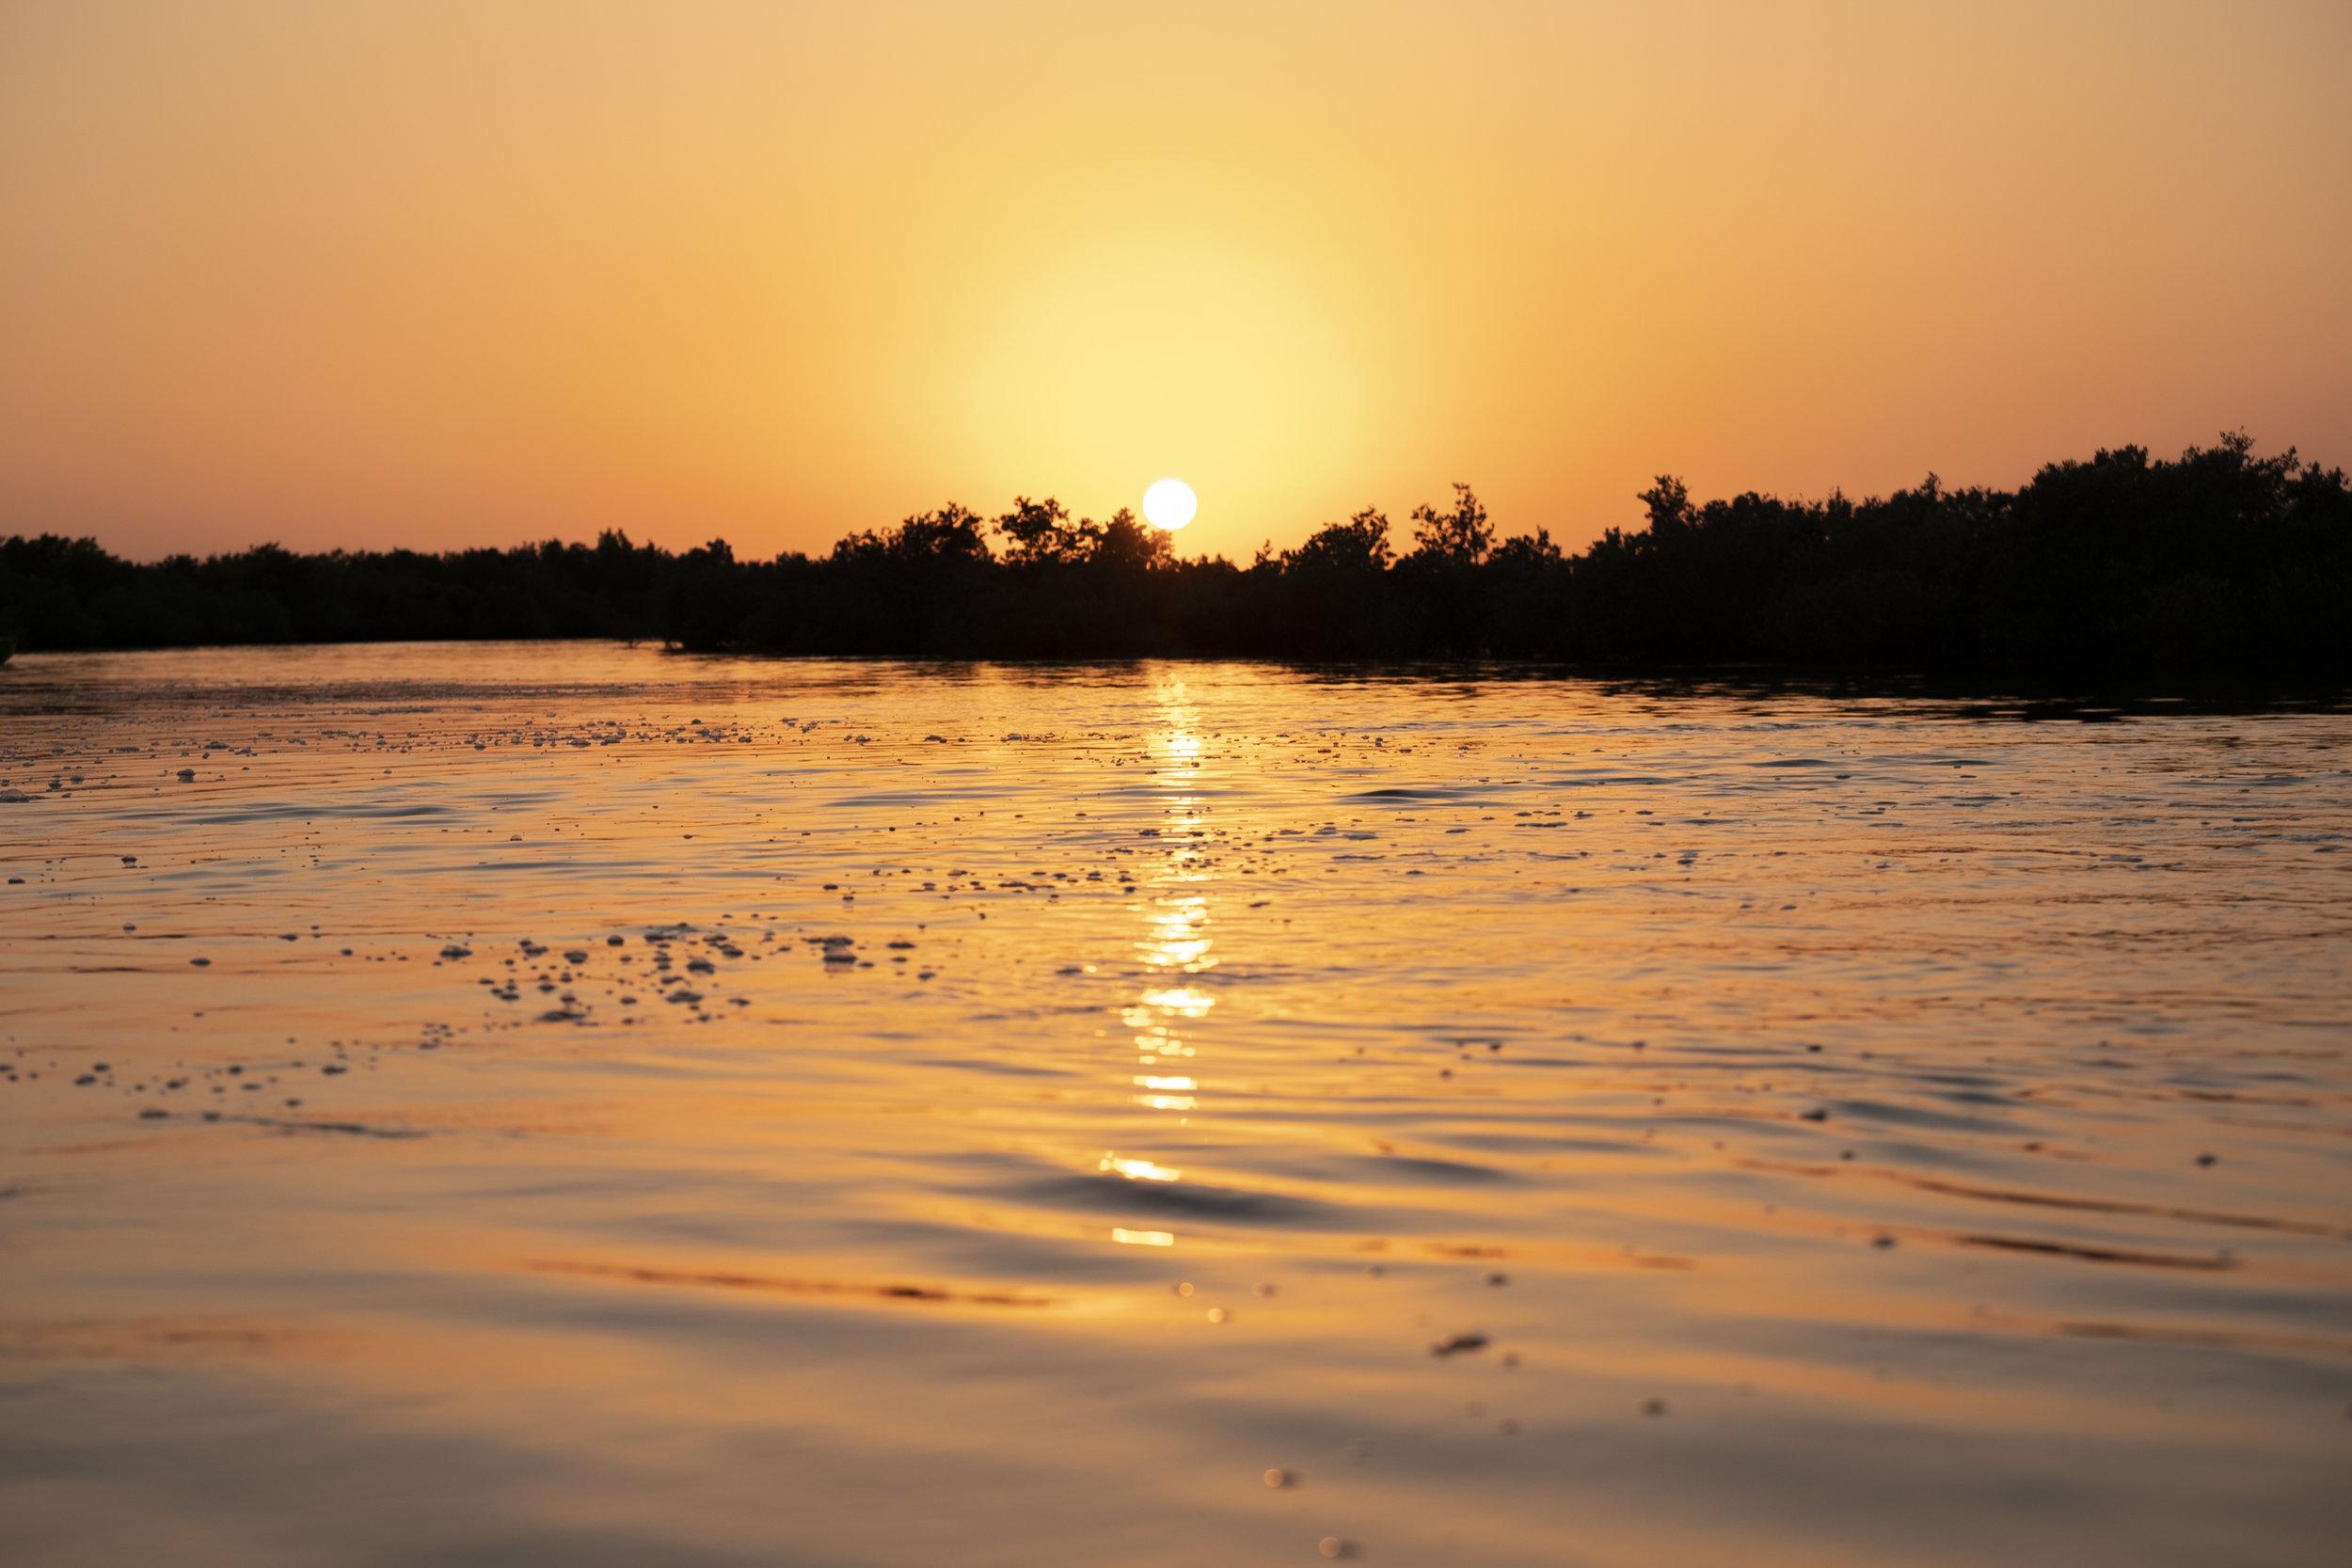 Calm water mangroves sunset_Abu Dhabi_(c)Oliver Wheeldon.jpg